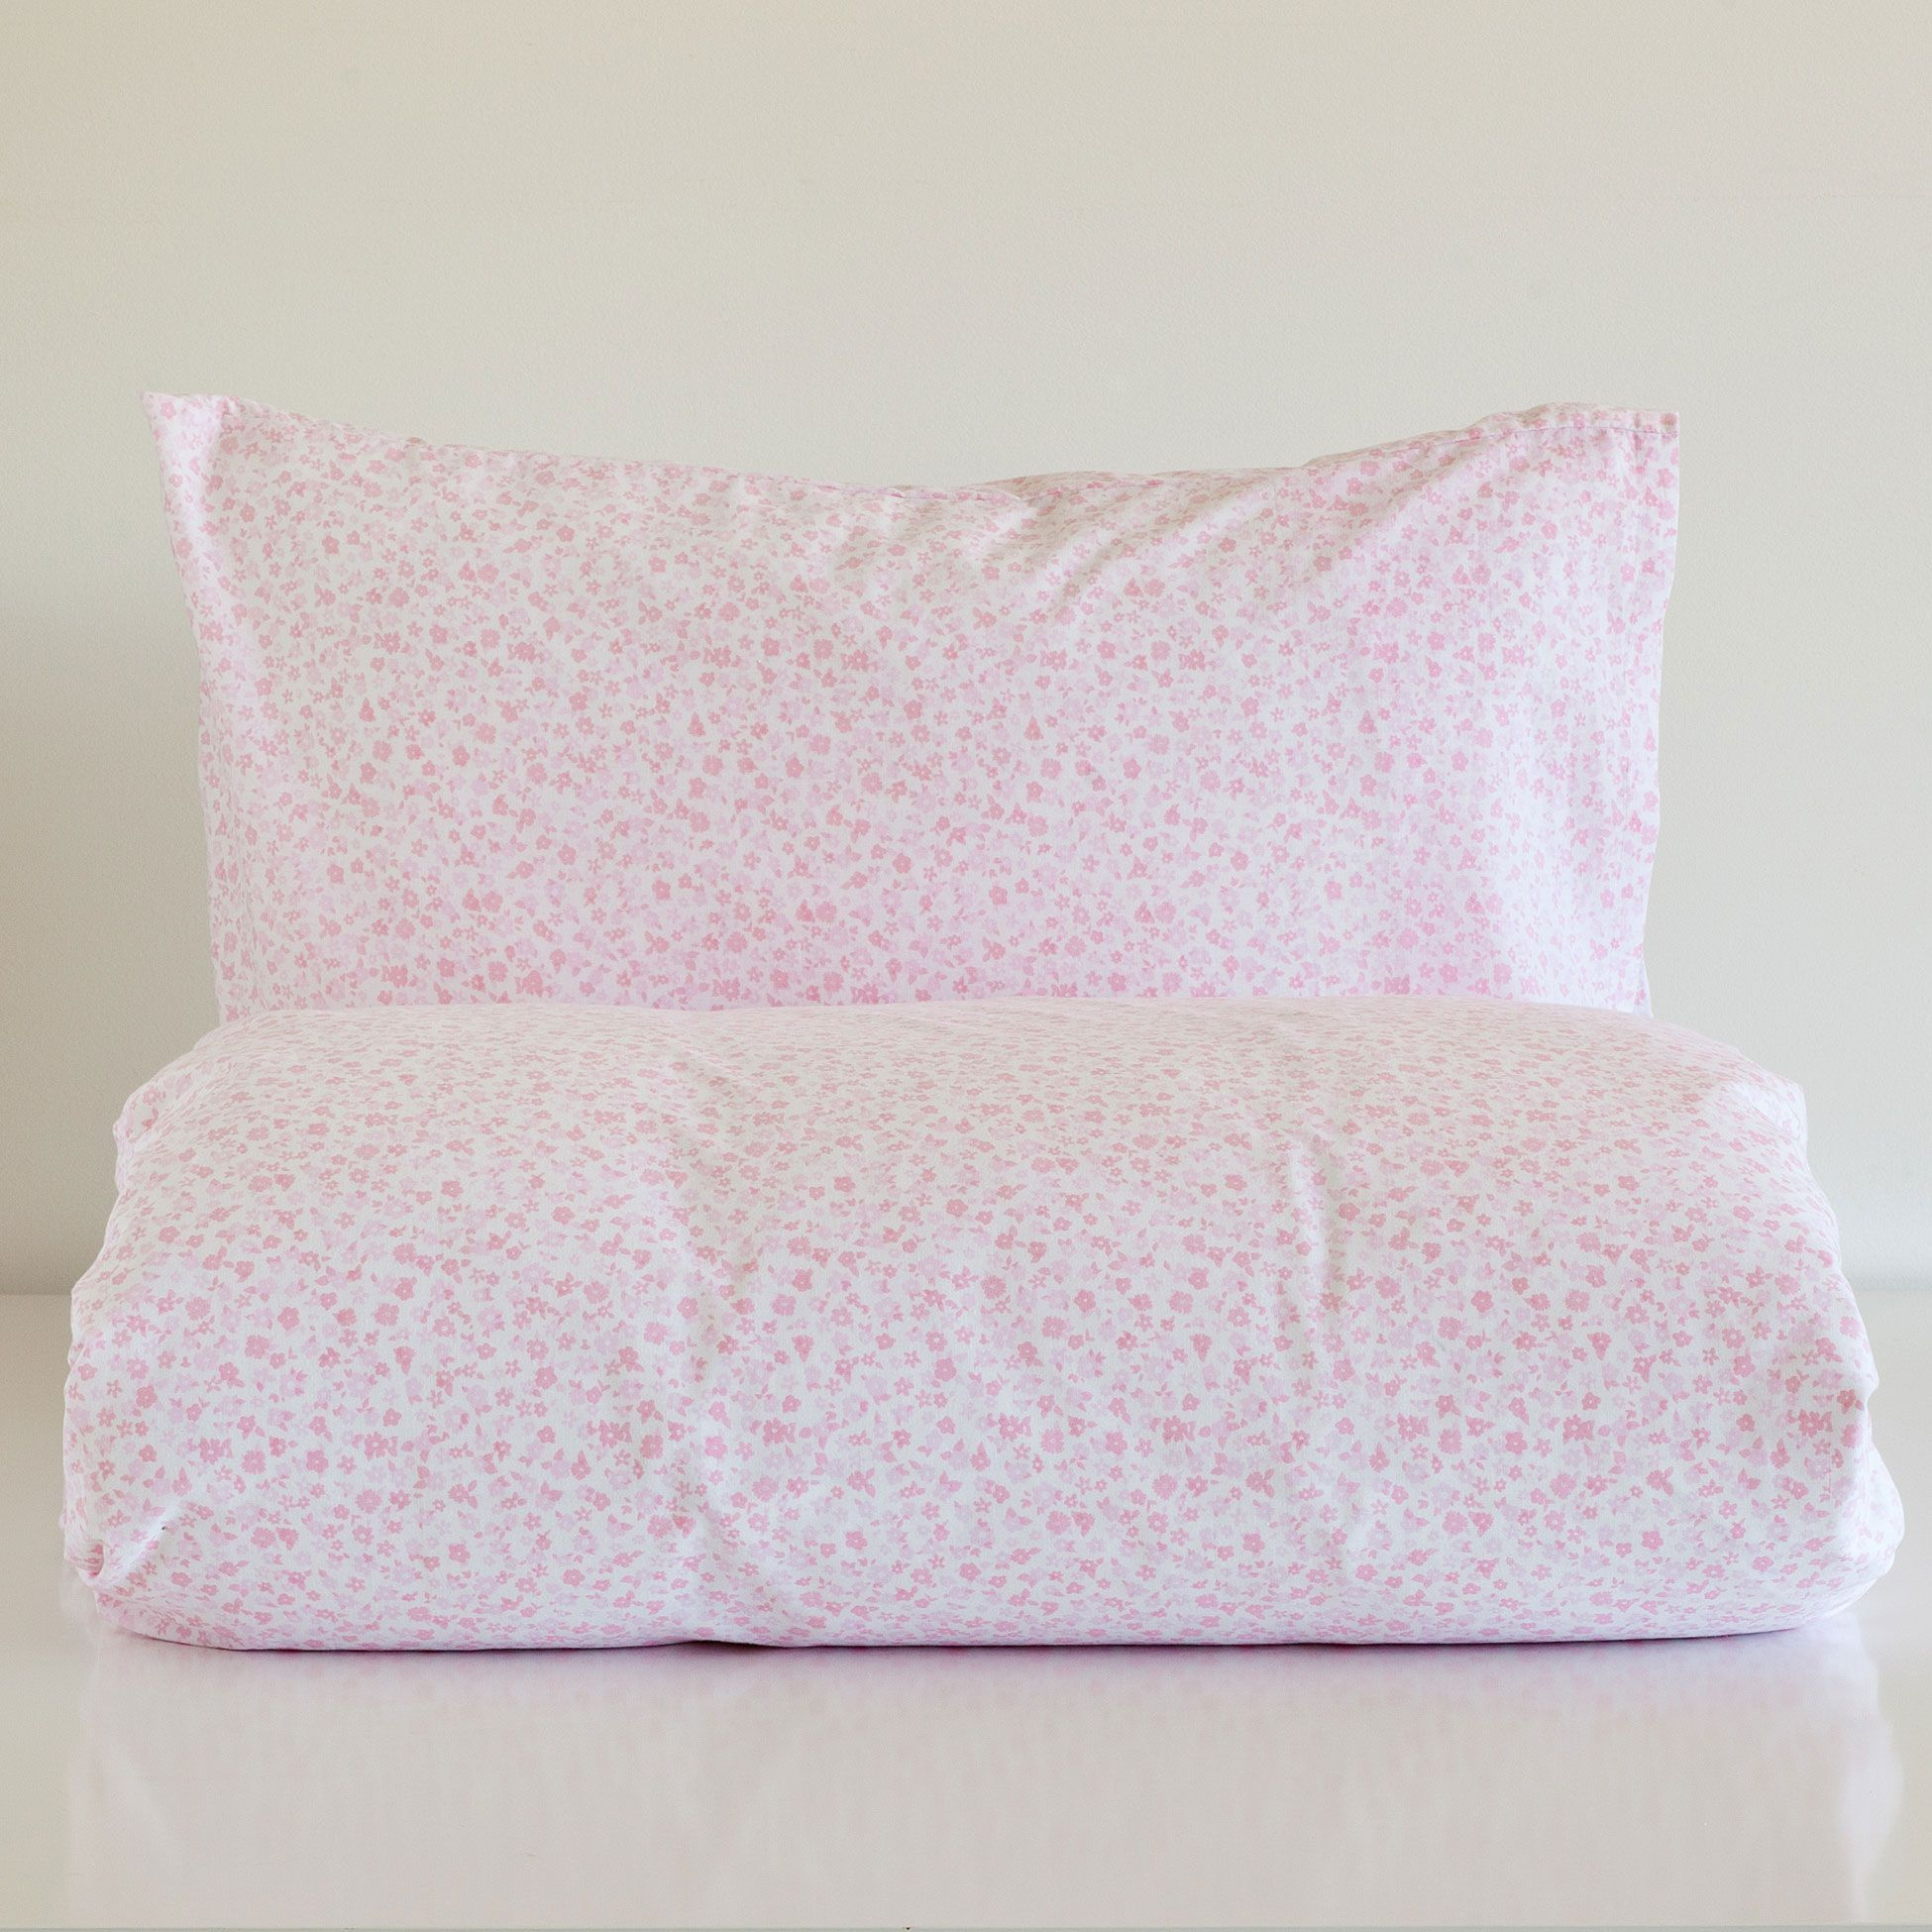 Floral duvet cover and pillow case set zara home basic - Funda nordica cuna zara home ...